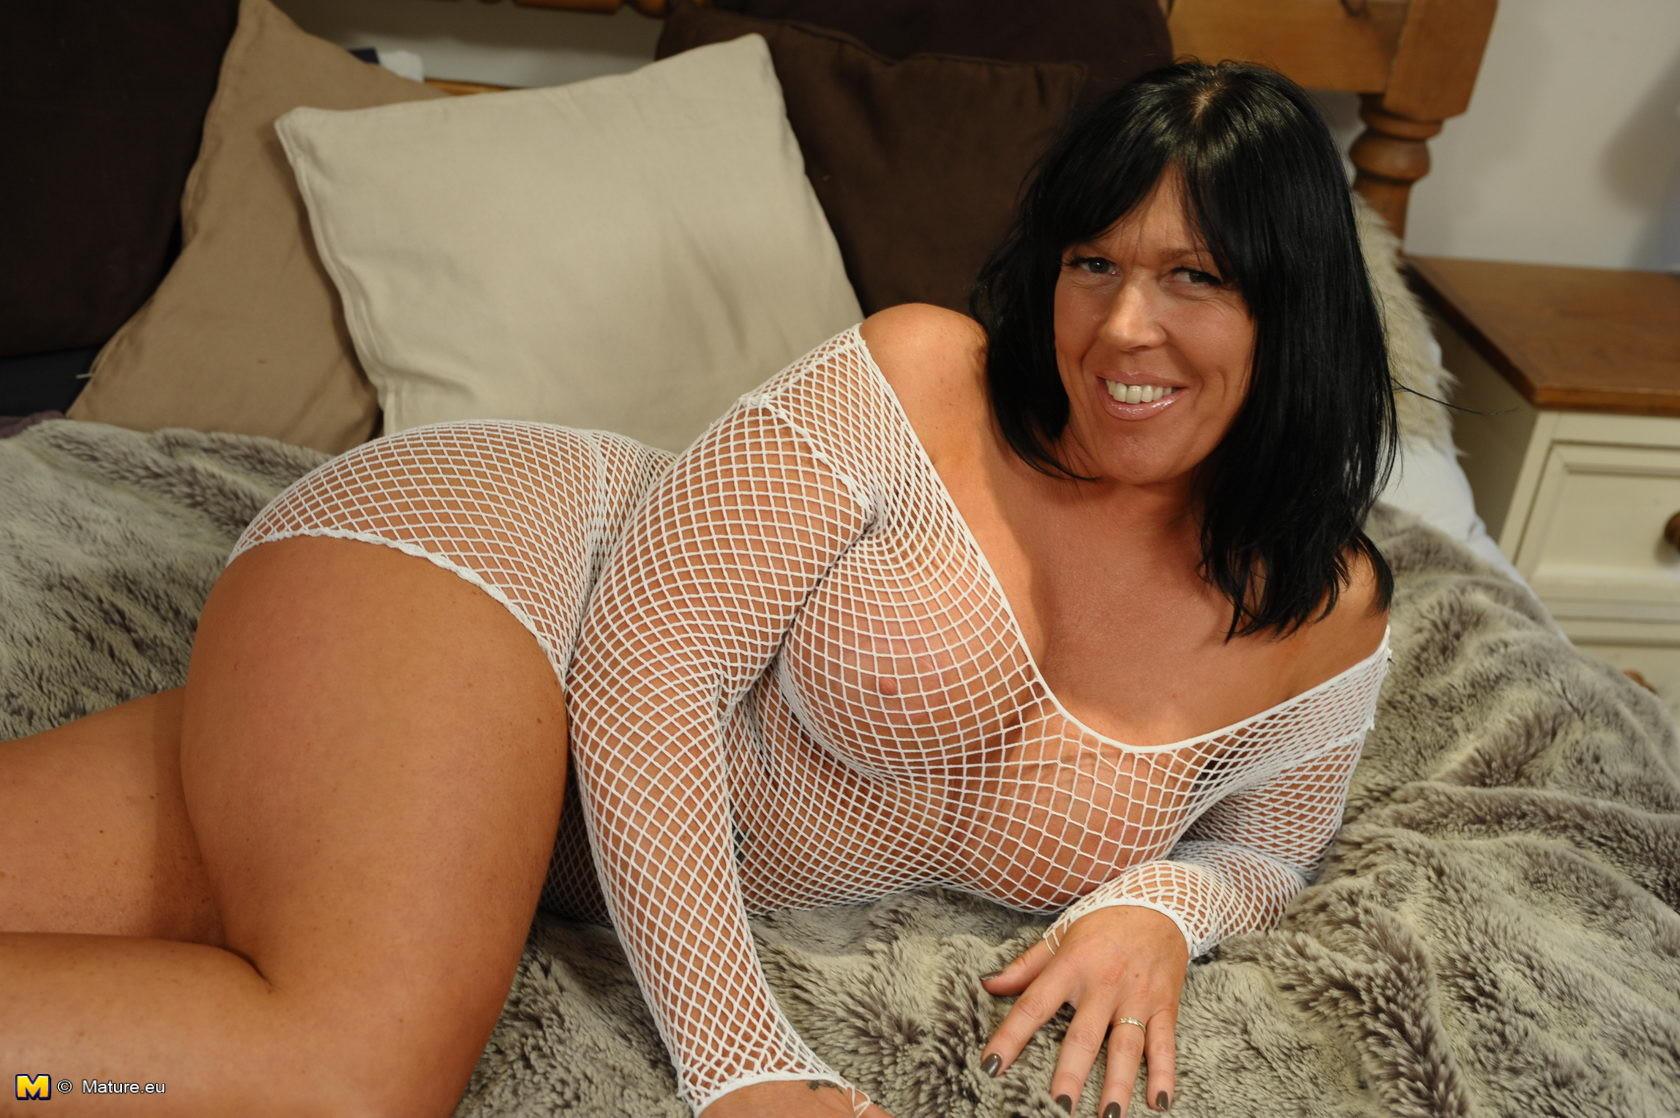 American big boob sex nude